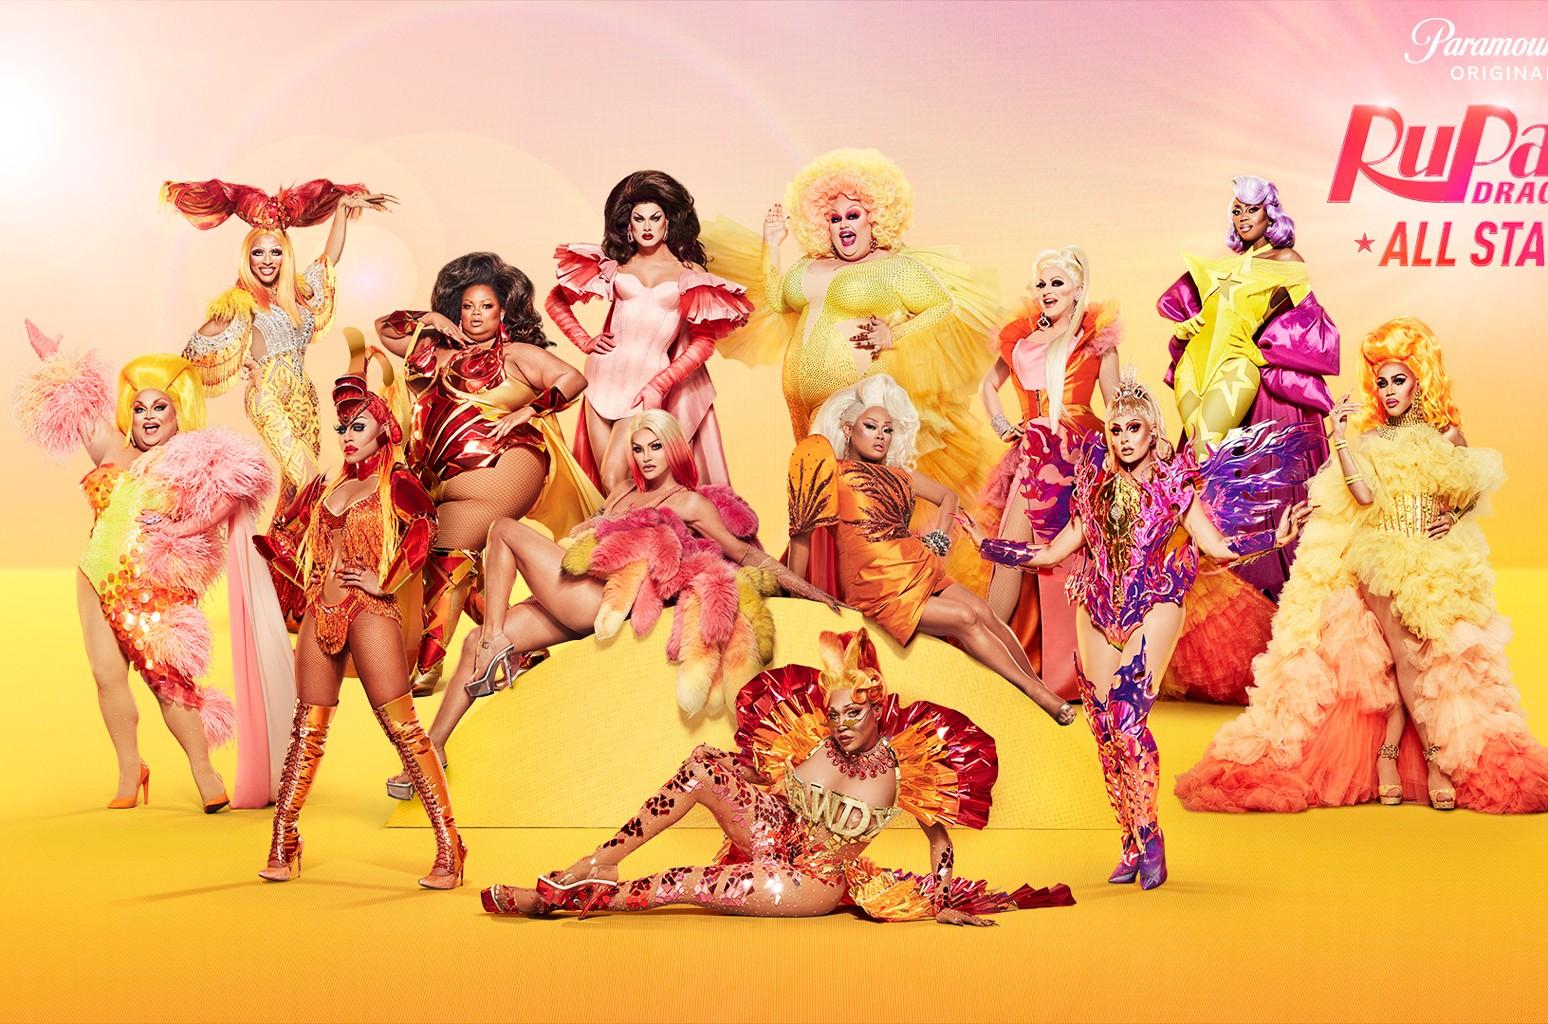 'RuPaul's Drag Race All Stars 6': Here's Who Won